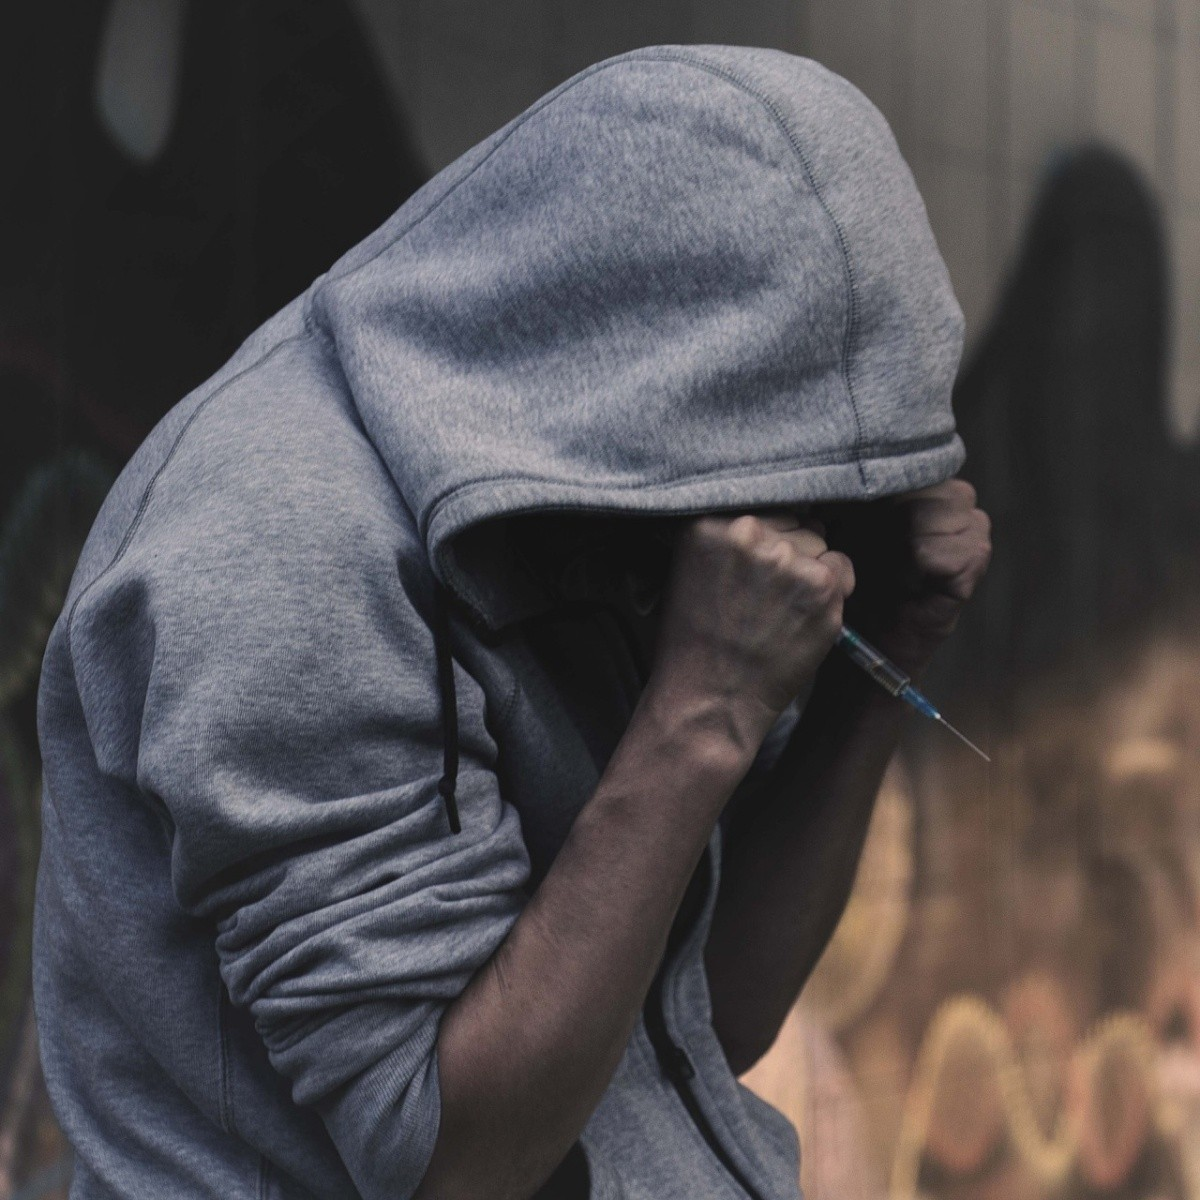 наркомания у подростков